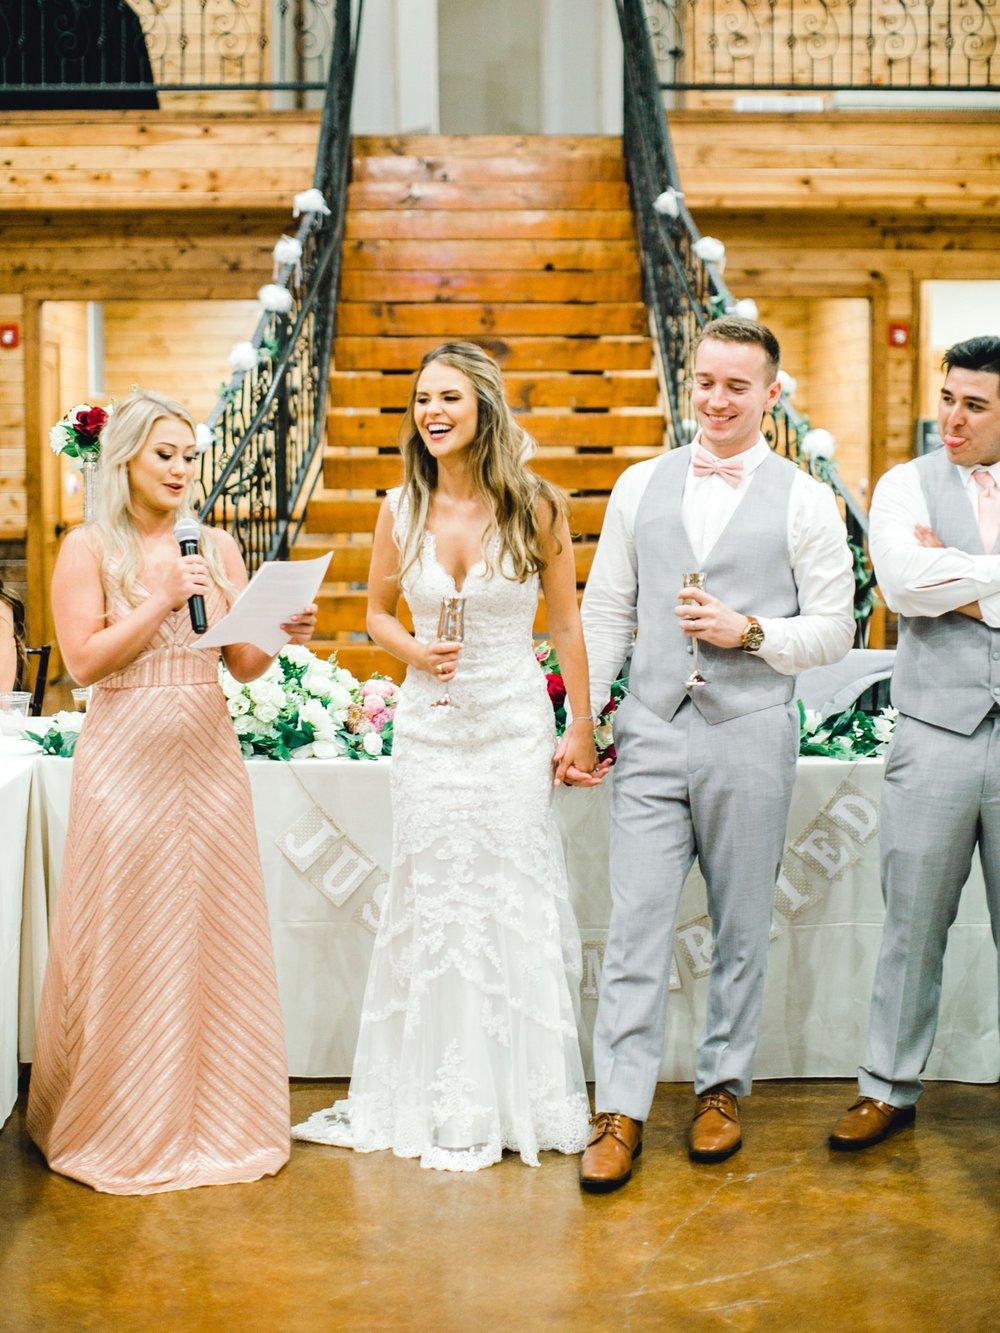 Aleah_and_Rowdy_Fenwick_Hidden_Creek_Events_Heath_Texas_Lubbock_Photographer_ALLEEJ_Weddings_0139.jpg